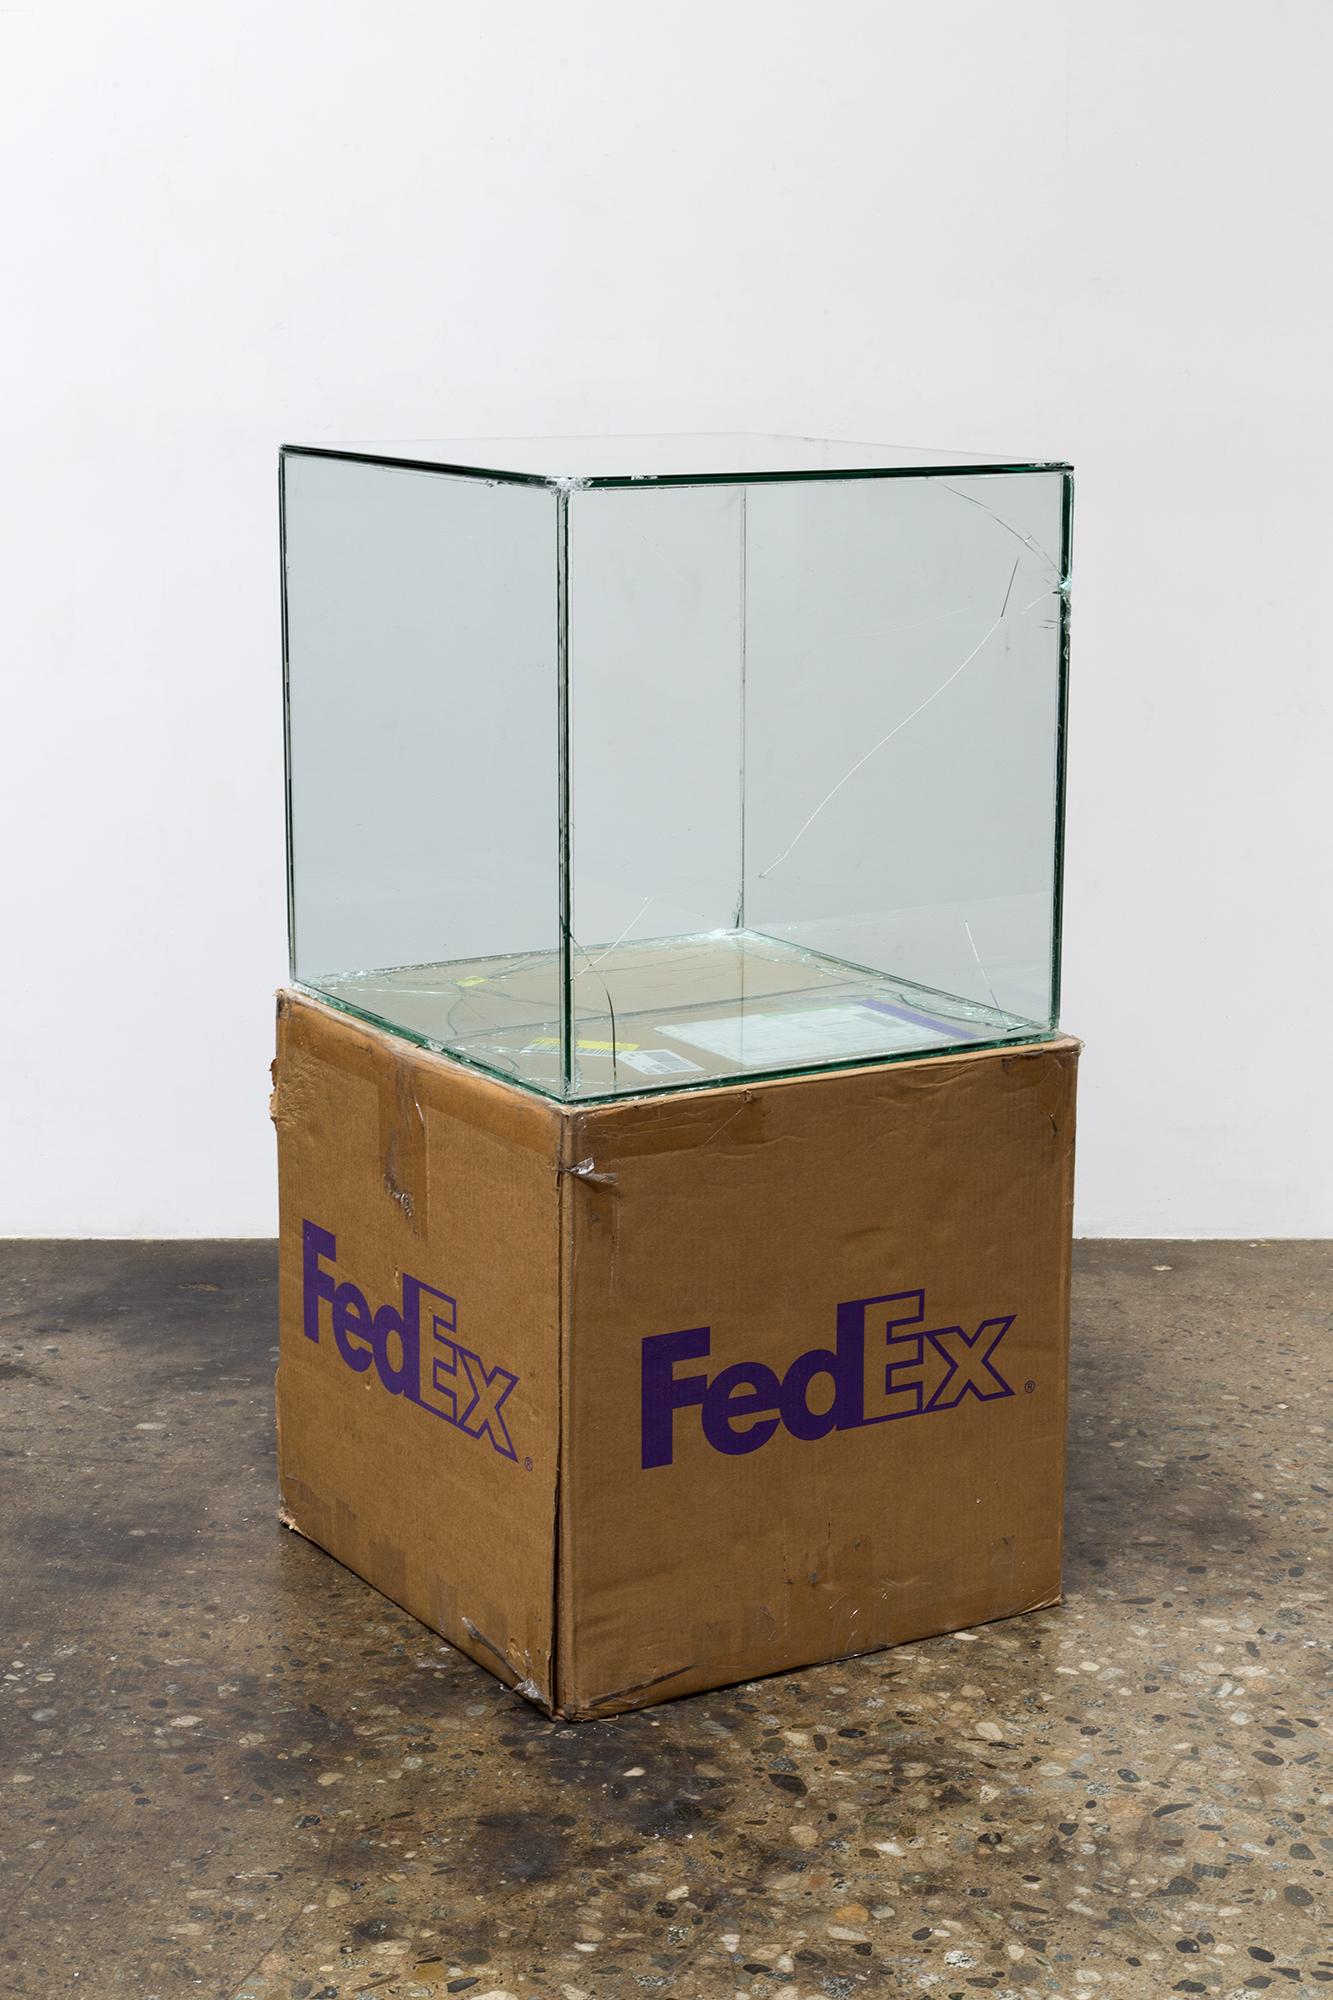 FedEx® Large Kraft Box  © 2008 FEDEX 330510 REV 6/08 GP, International Priority, Los Angeles–Tokyo trk#778608512056, March 9–13, 2017    2017–   Laminated glass, FedEx shipping box, accrued FedEx shipping and tracking labels, silicone, metal, tape  24 x 24 x 24 inches   FedEx Glass Works, 2007–